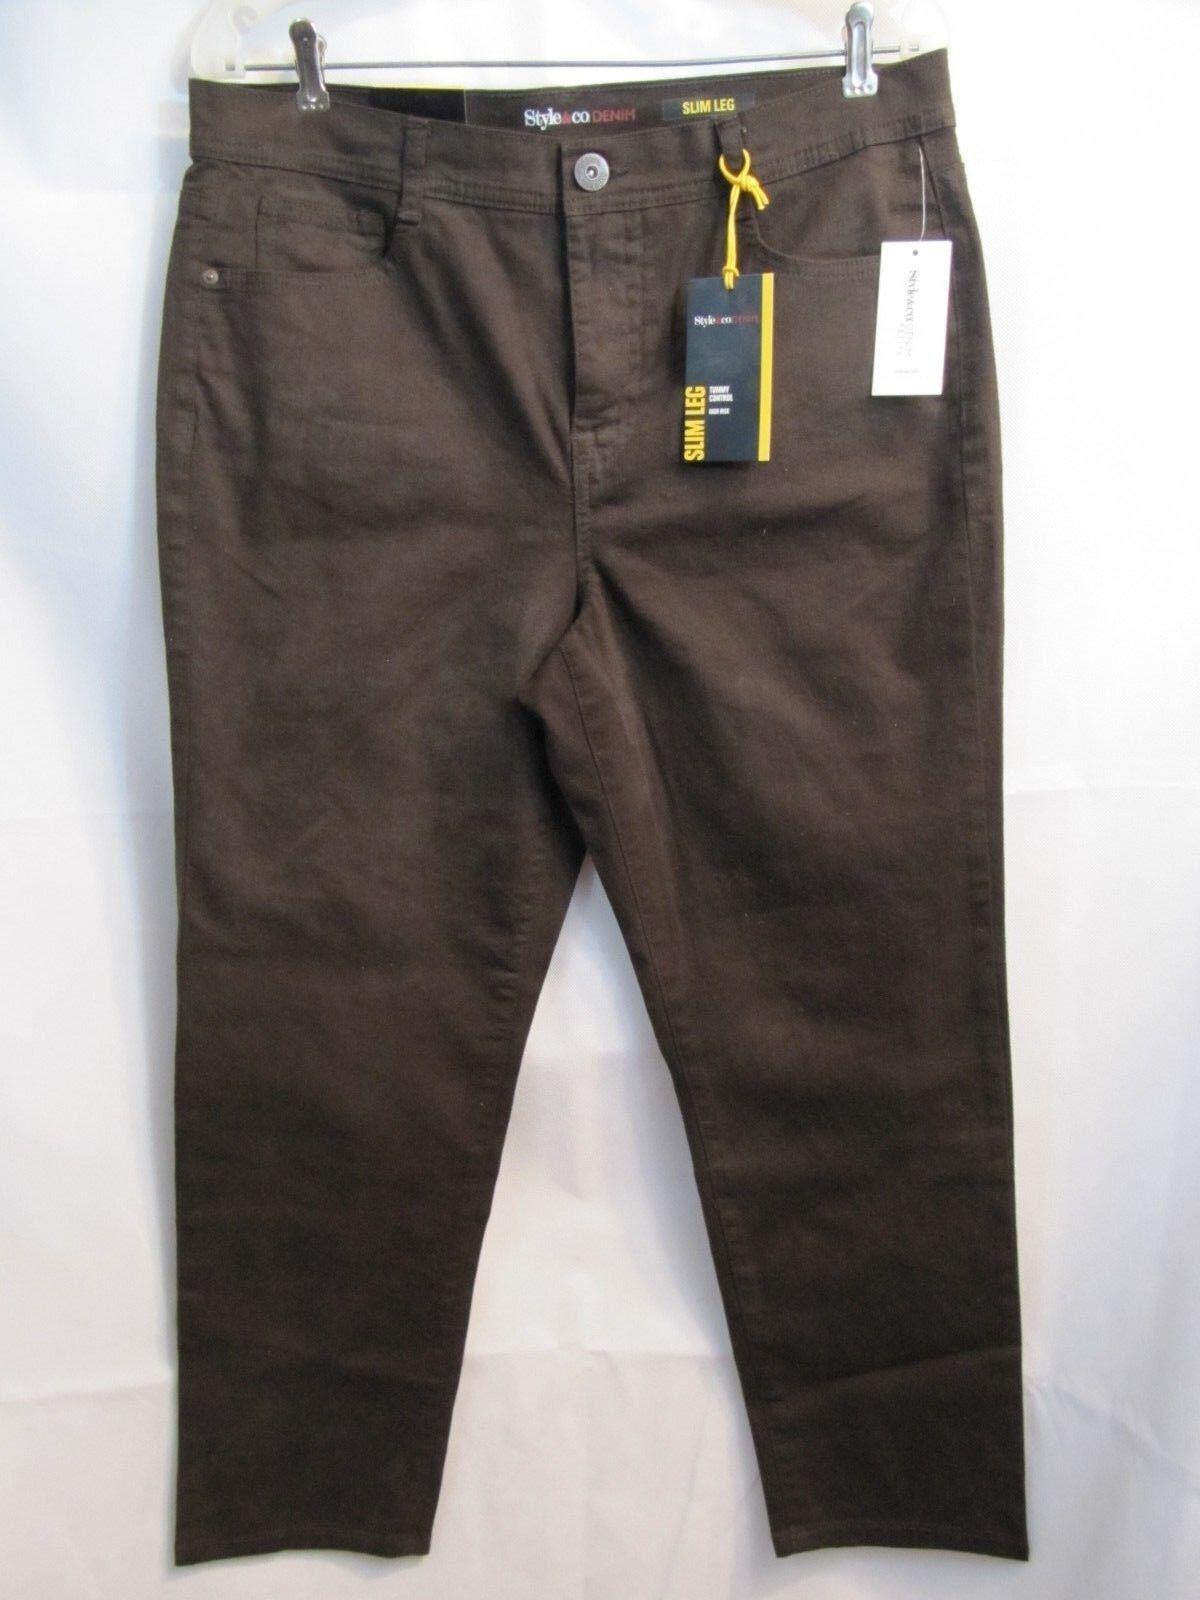 Style & Co Denim Brown Espresso Bean Jeans Slim Leg High Rise Size 14P Short NWT